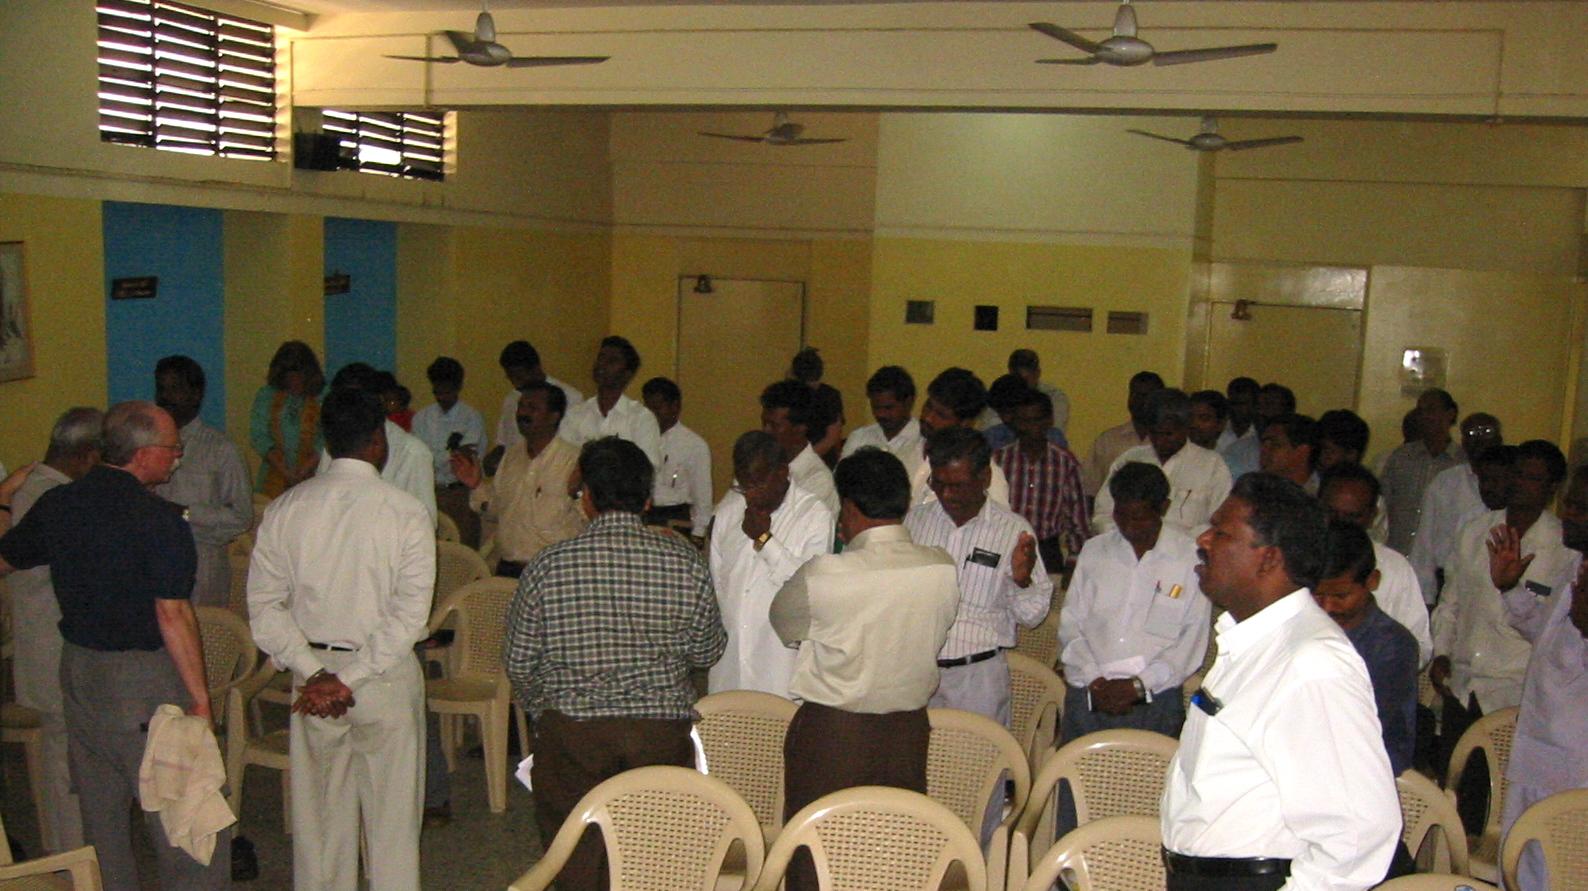 20190307 - More Like Jesus - Pastors Gathering.jpg